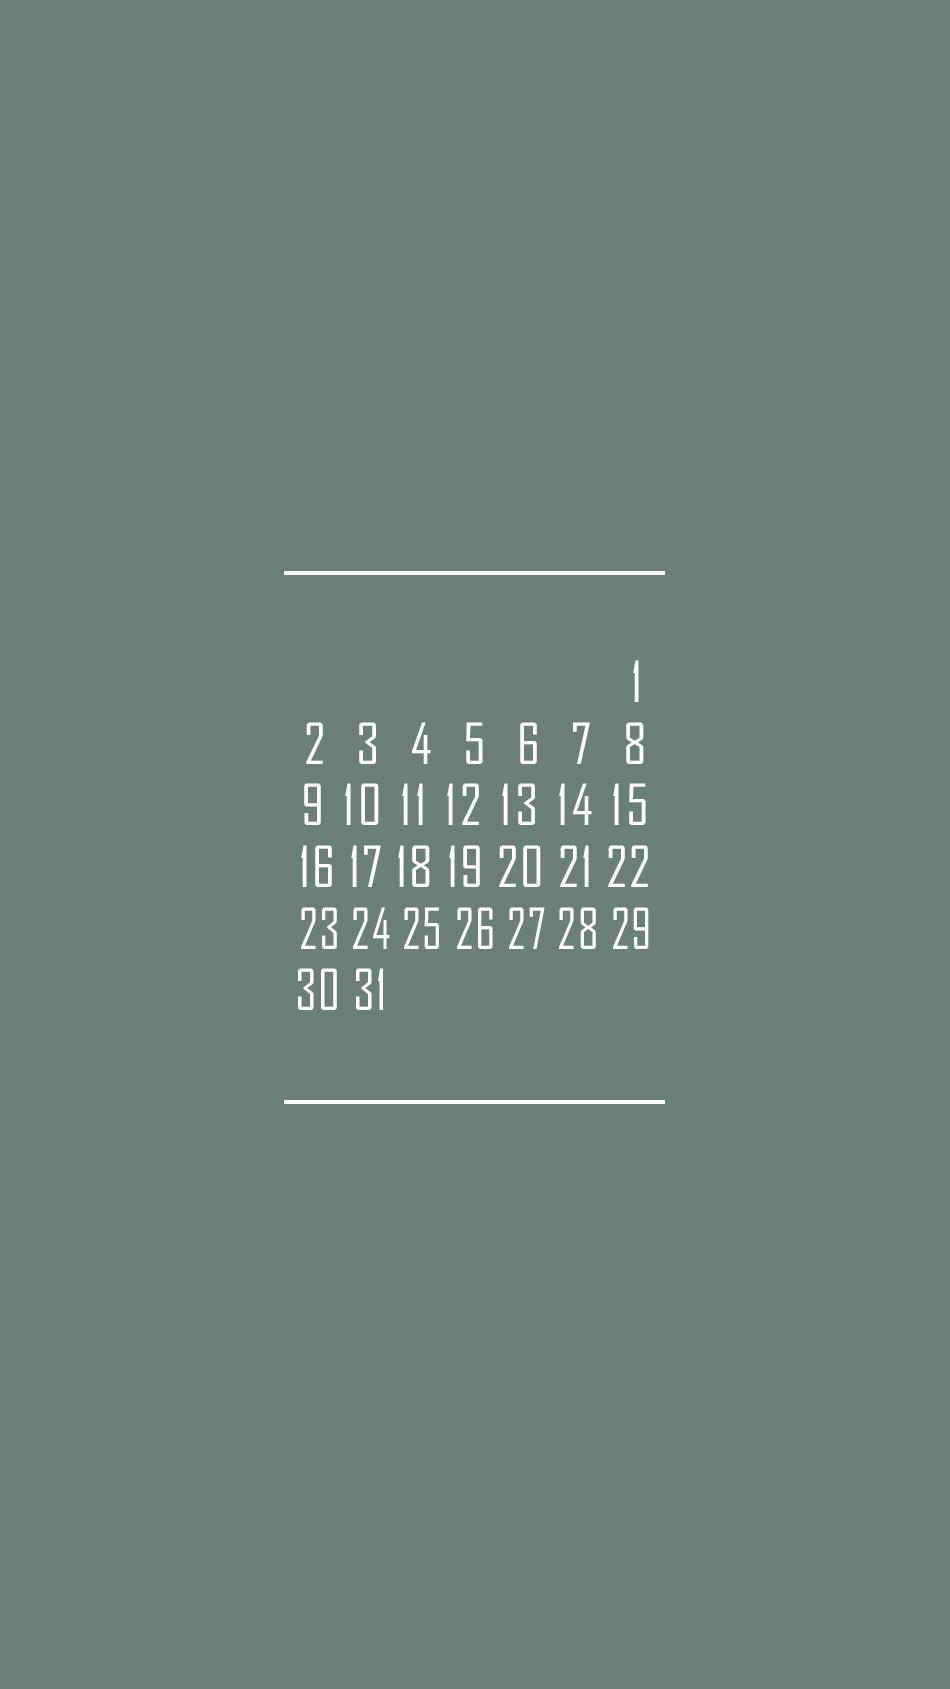 календарь на август 8 2 district-f.org